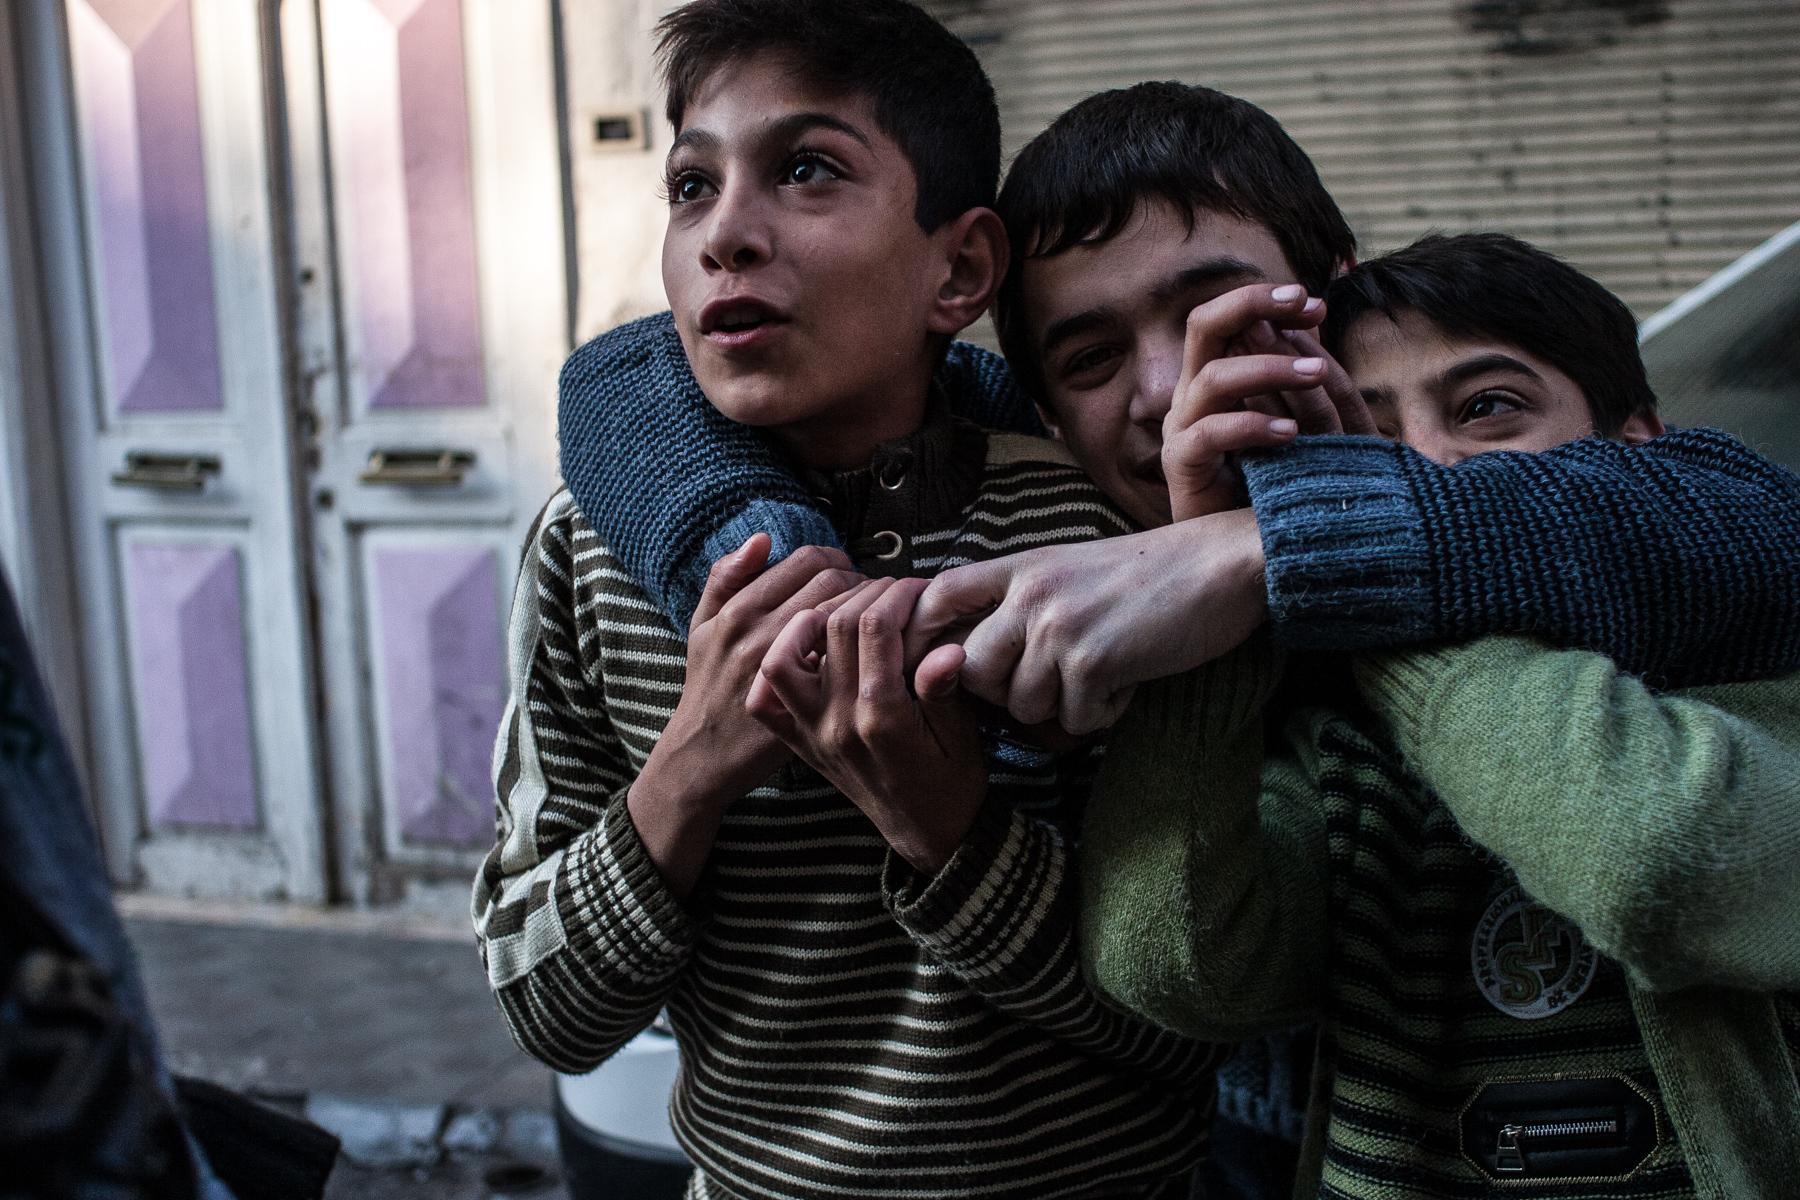 Damascus/Syria